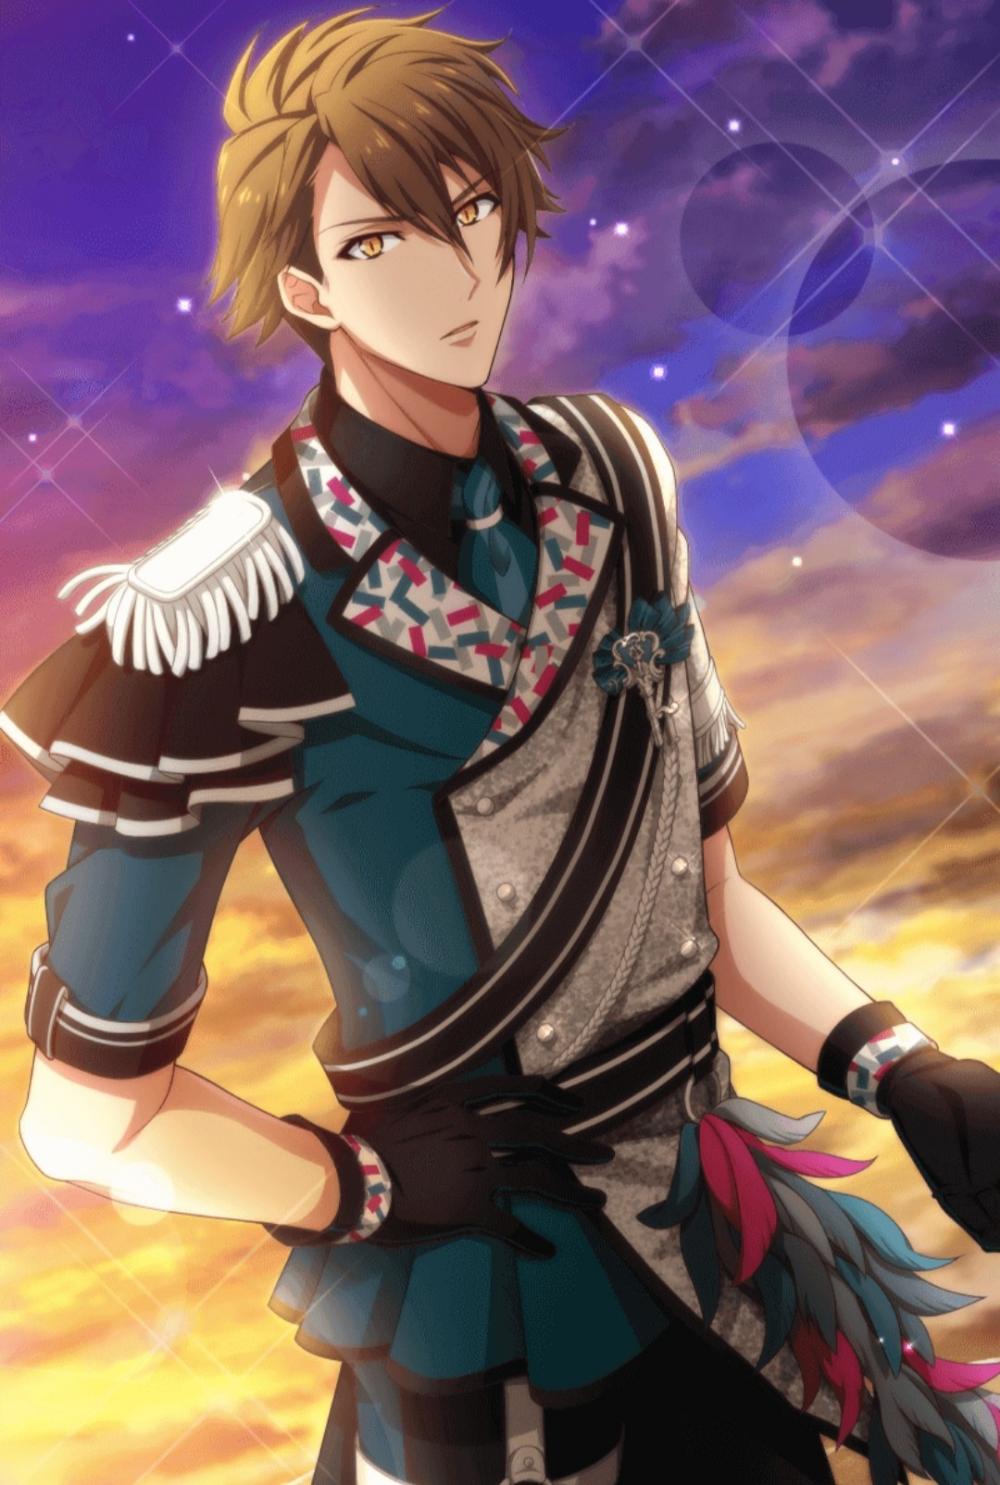 Idolish7 Cards in 2020 Anime music, Anime boy